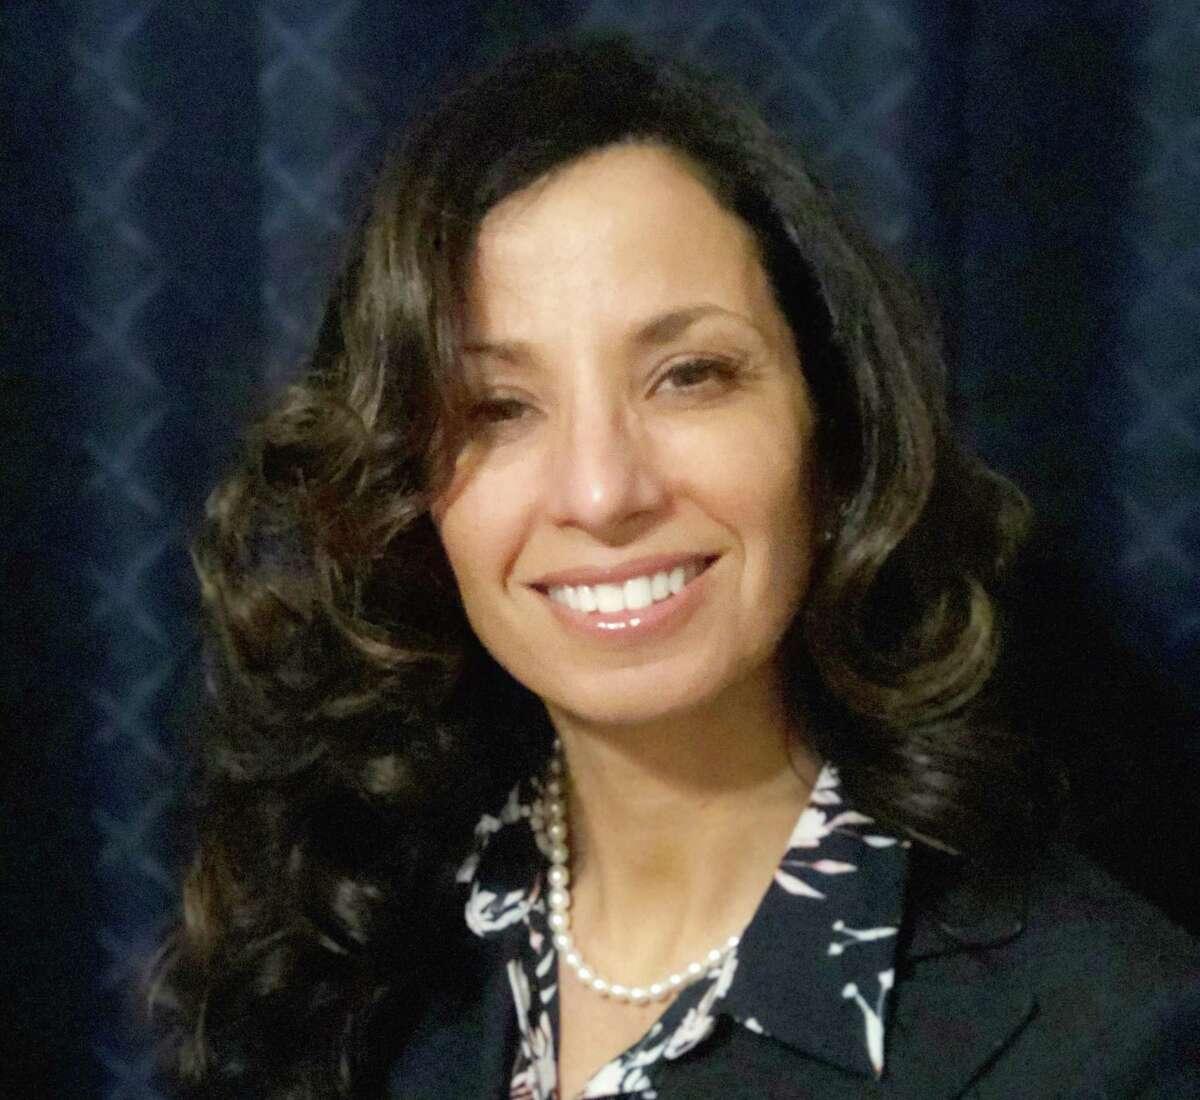 Ridgefield Superintendent Susie Da Silva